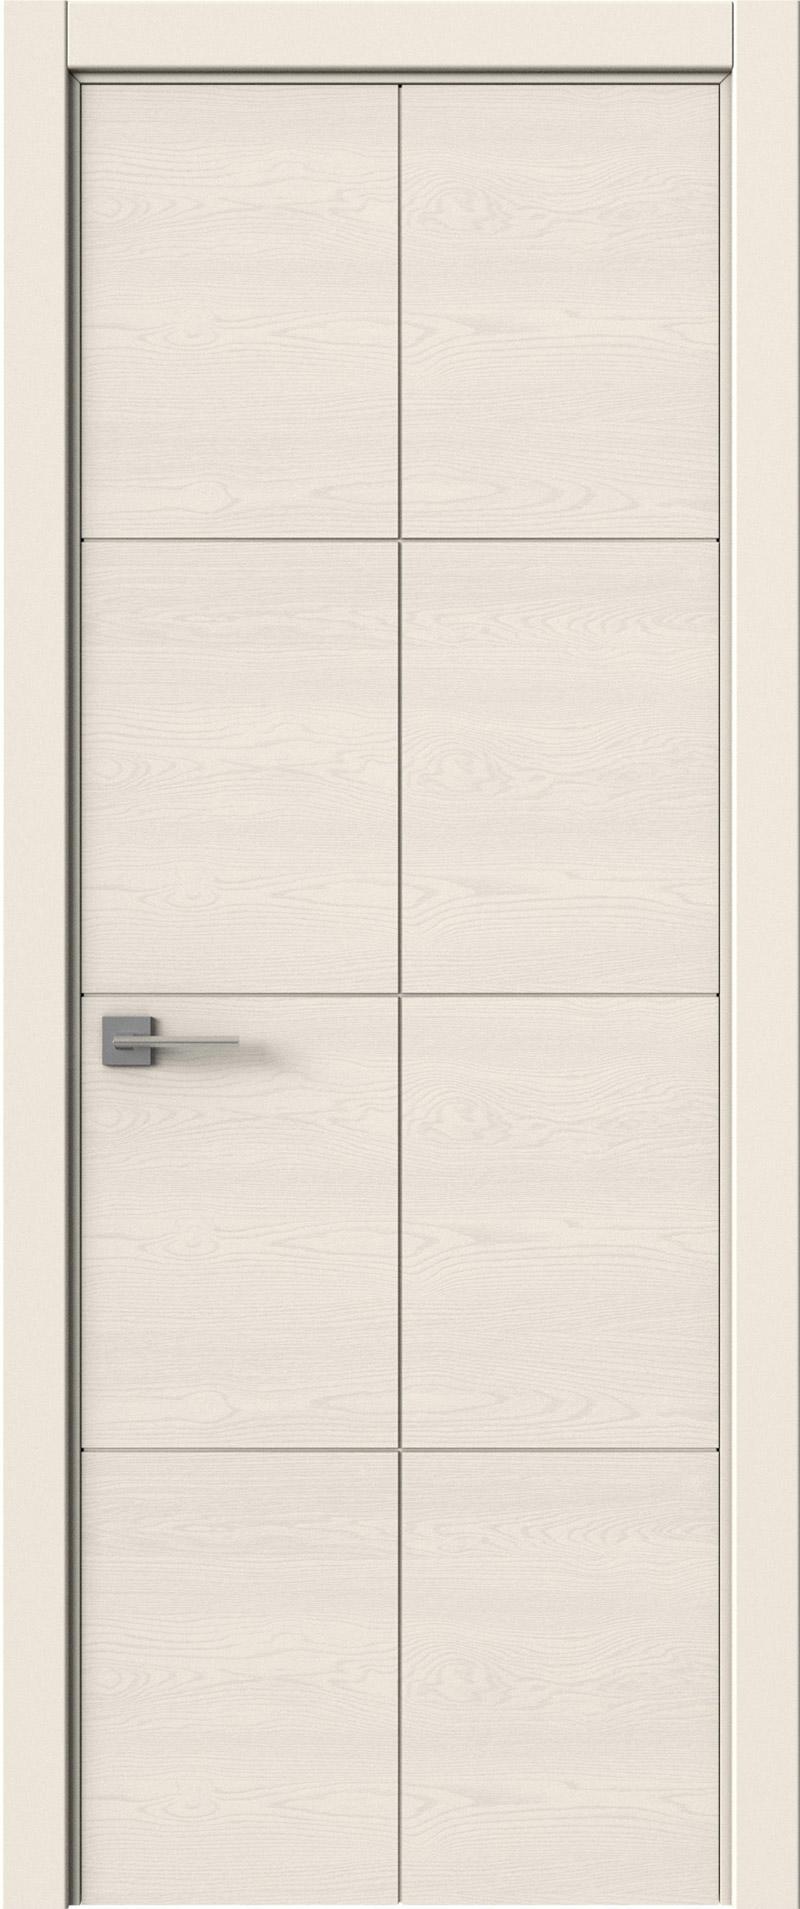 Tivoli Л-2 цвет - Бежевая эмаль по шпону (RAL 9010) Без стекла (ДГ)